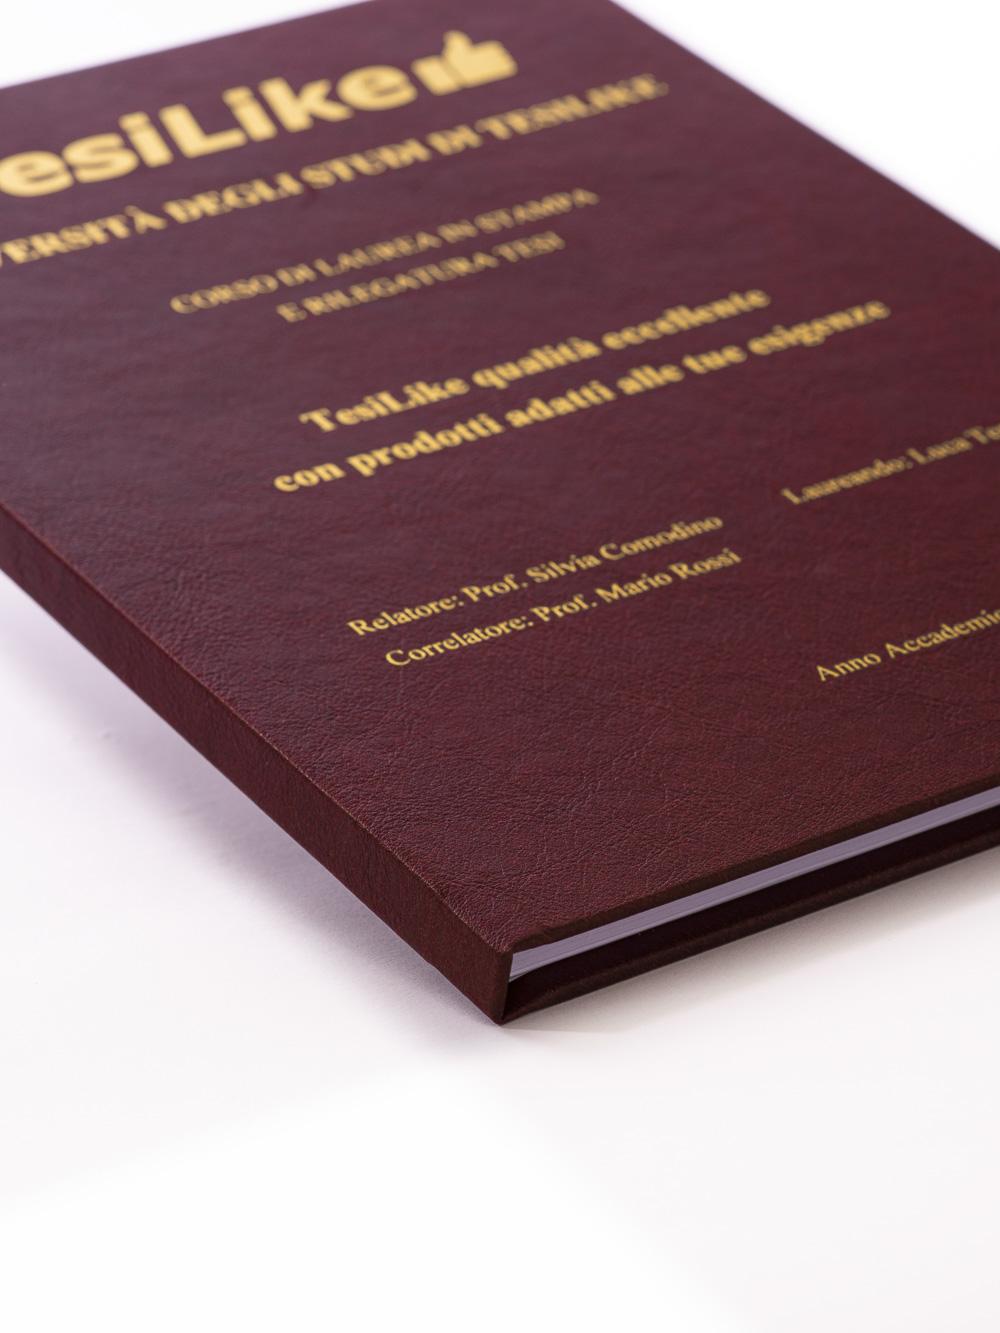 copertina-tesi-rigida-morbida-bordeaux-frontespizio-oro-dettaglio-tesilike